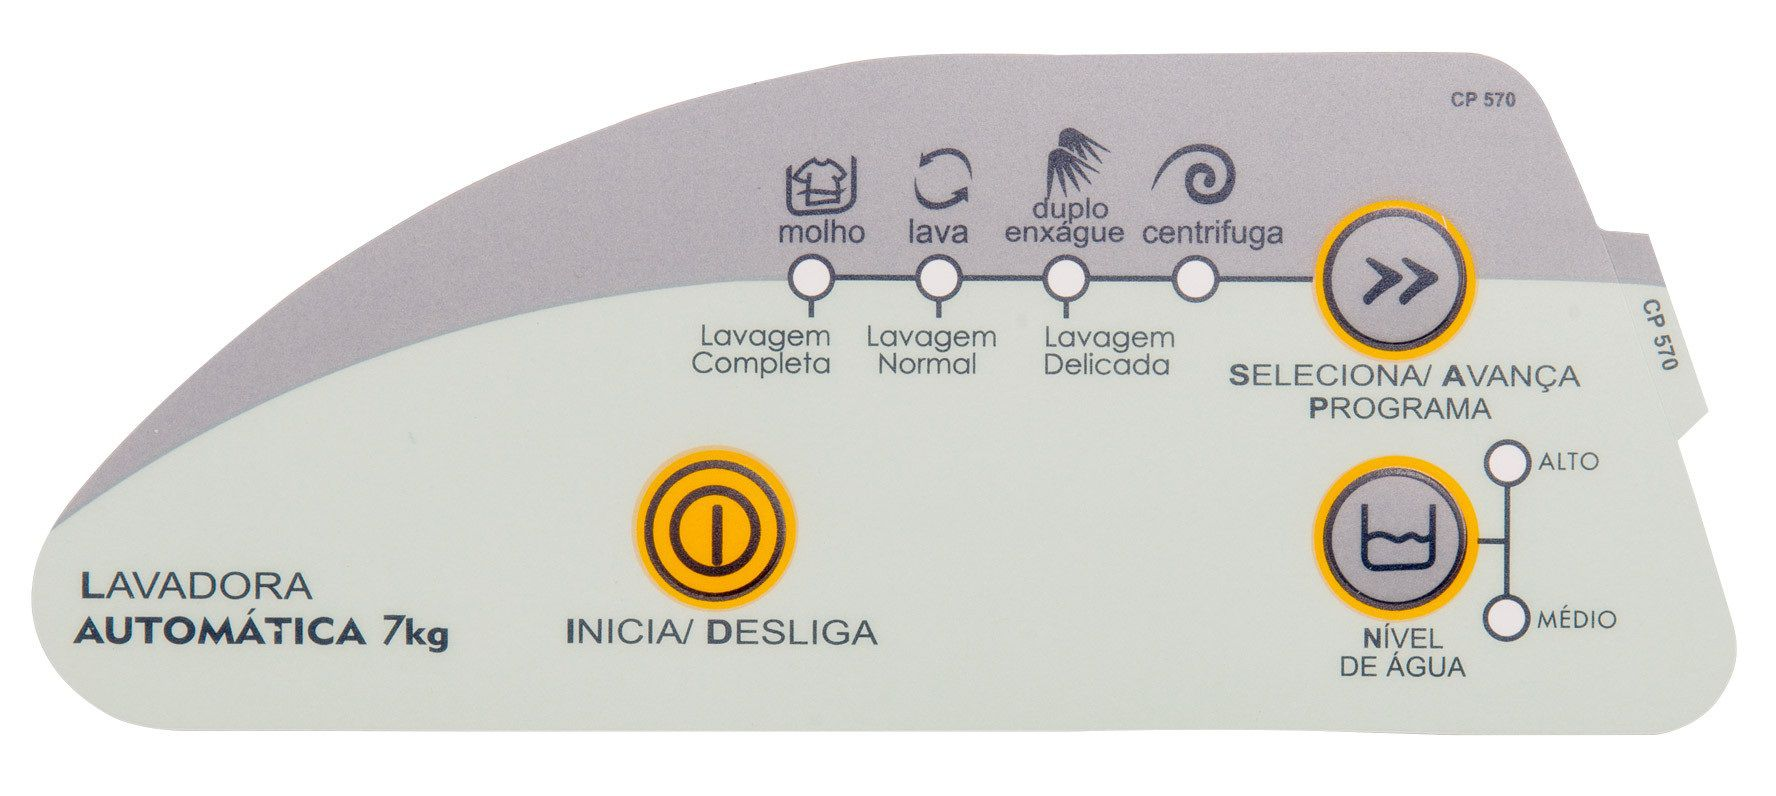 Painel Decorativo Compatível Lavadora CWC24A 7kg 326008412-CP0570